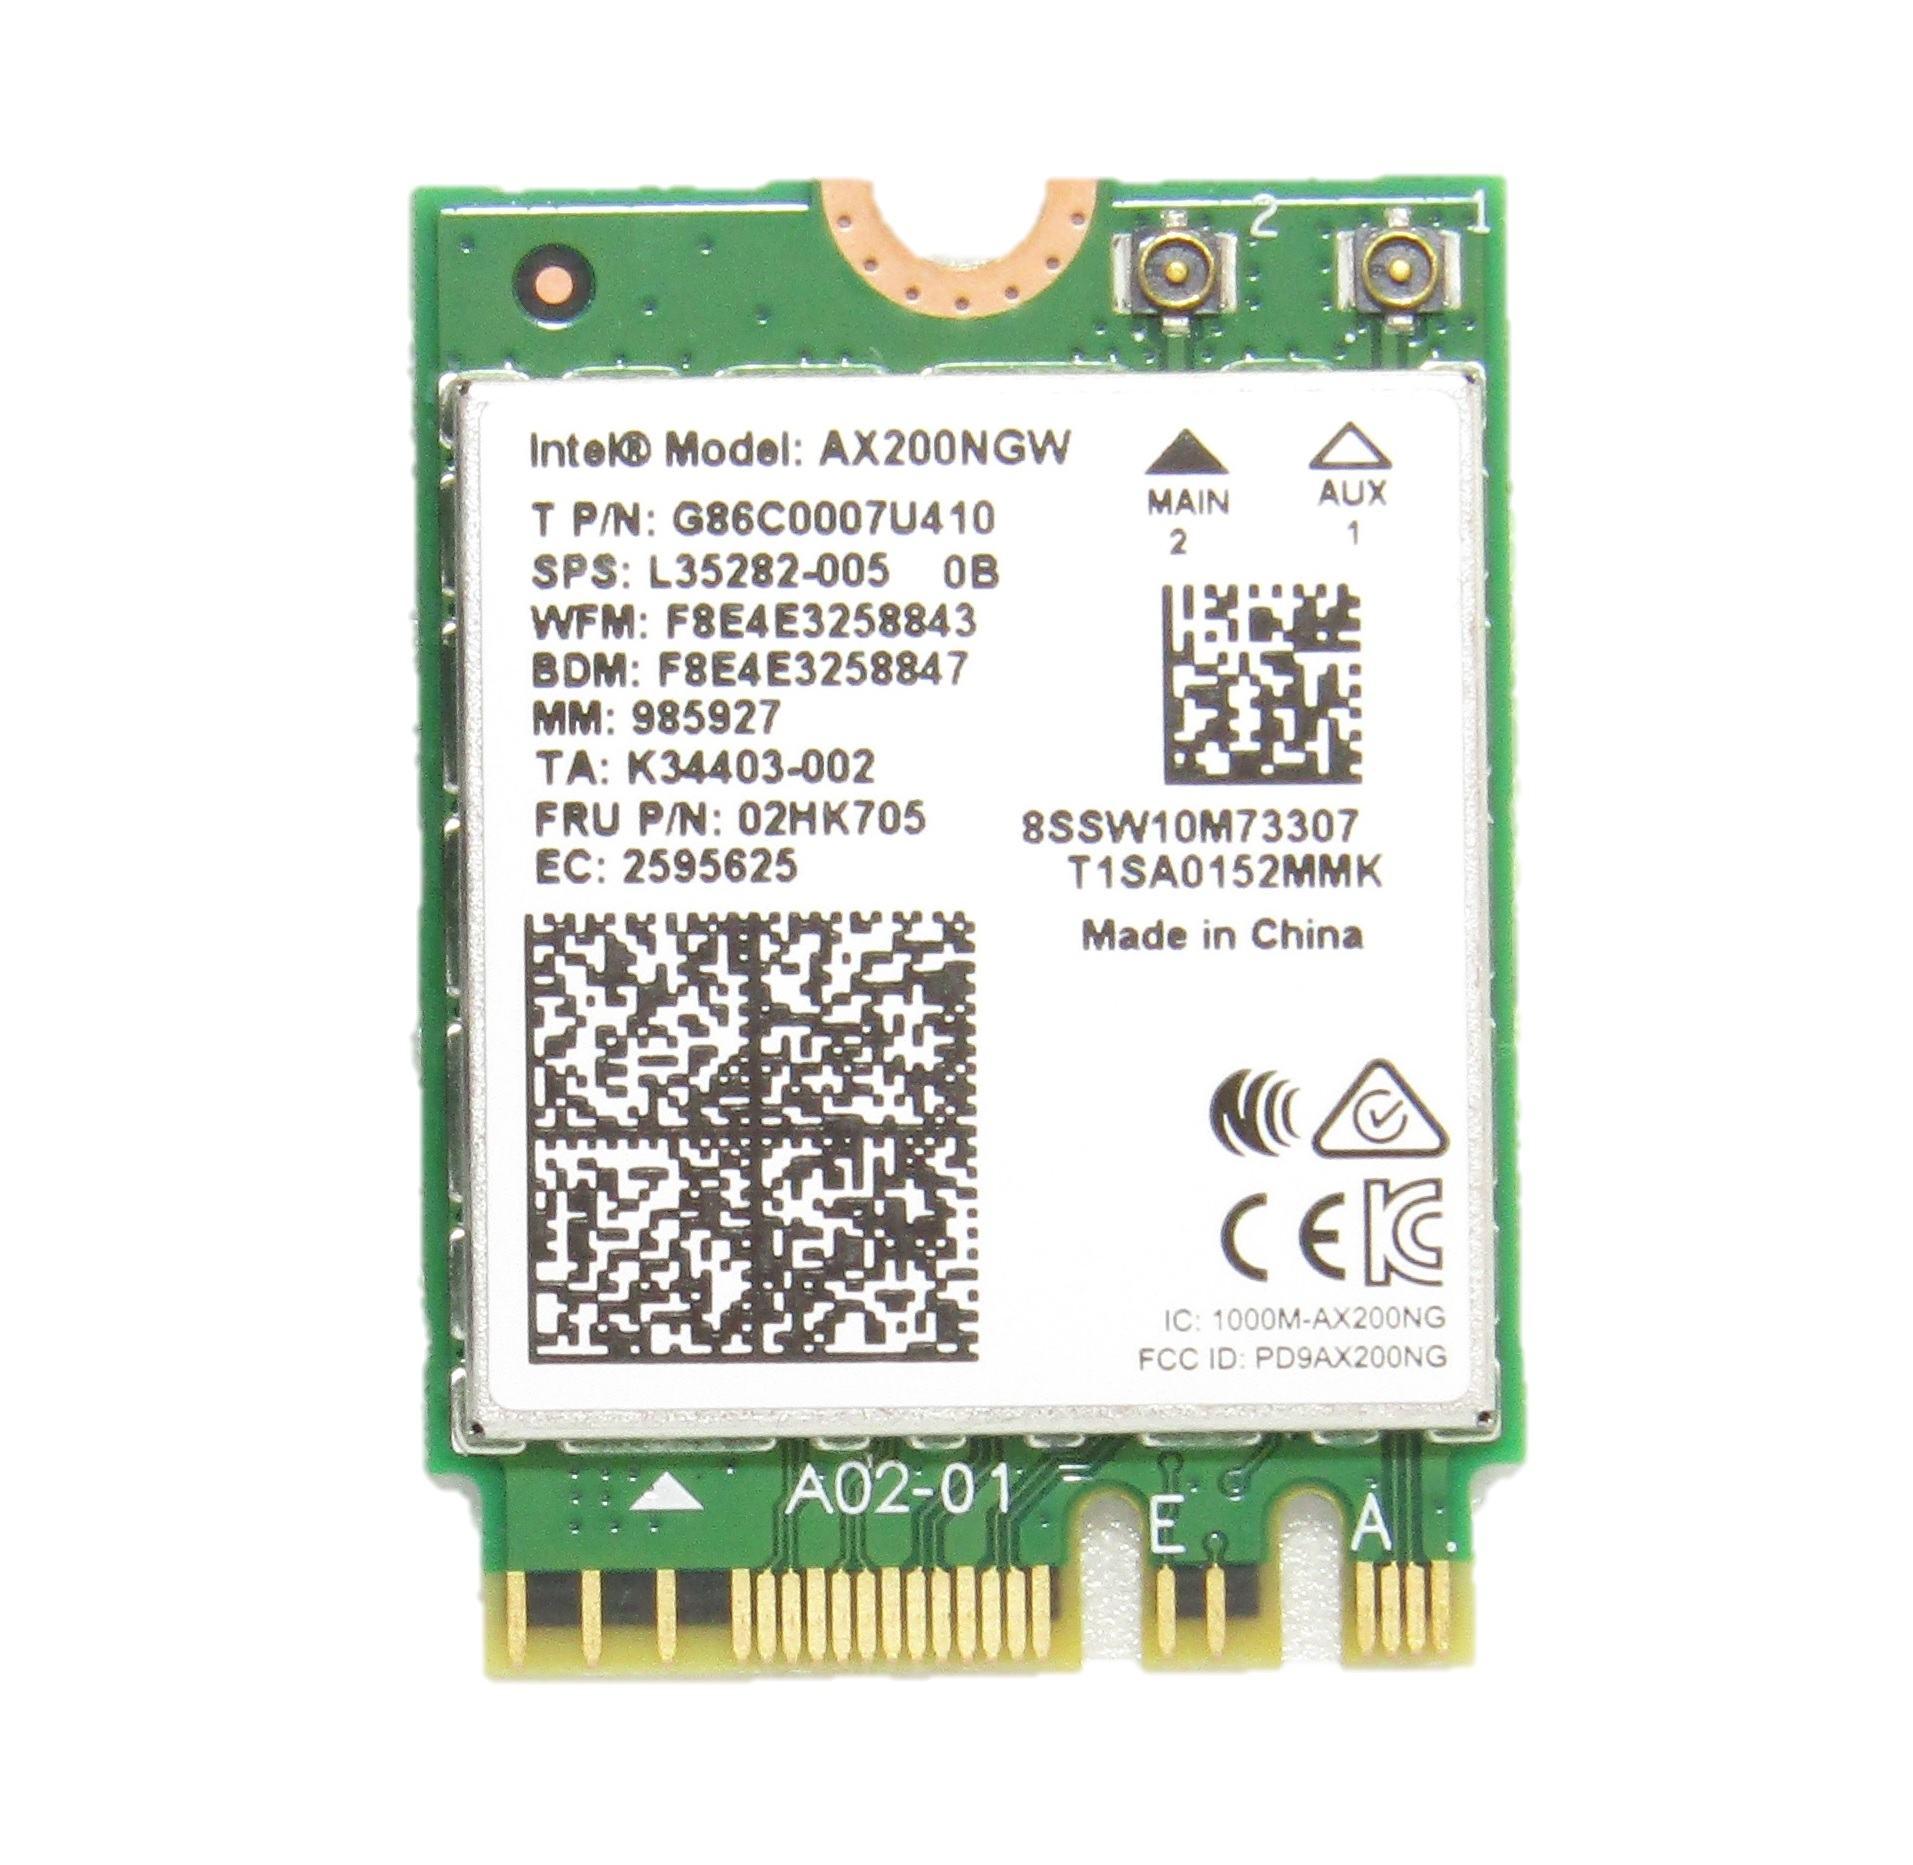 intel Wi-Fi 6 bluetooth 新作送料無料 5.0 一部予約 インテル Intel AX200 AX200NGW 802.11AX + 子機 m.2 M.2 m2 ワイヤレスカード Bluetooth NGFF ノート note パソコン アップグレード